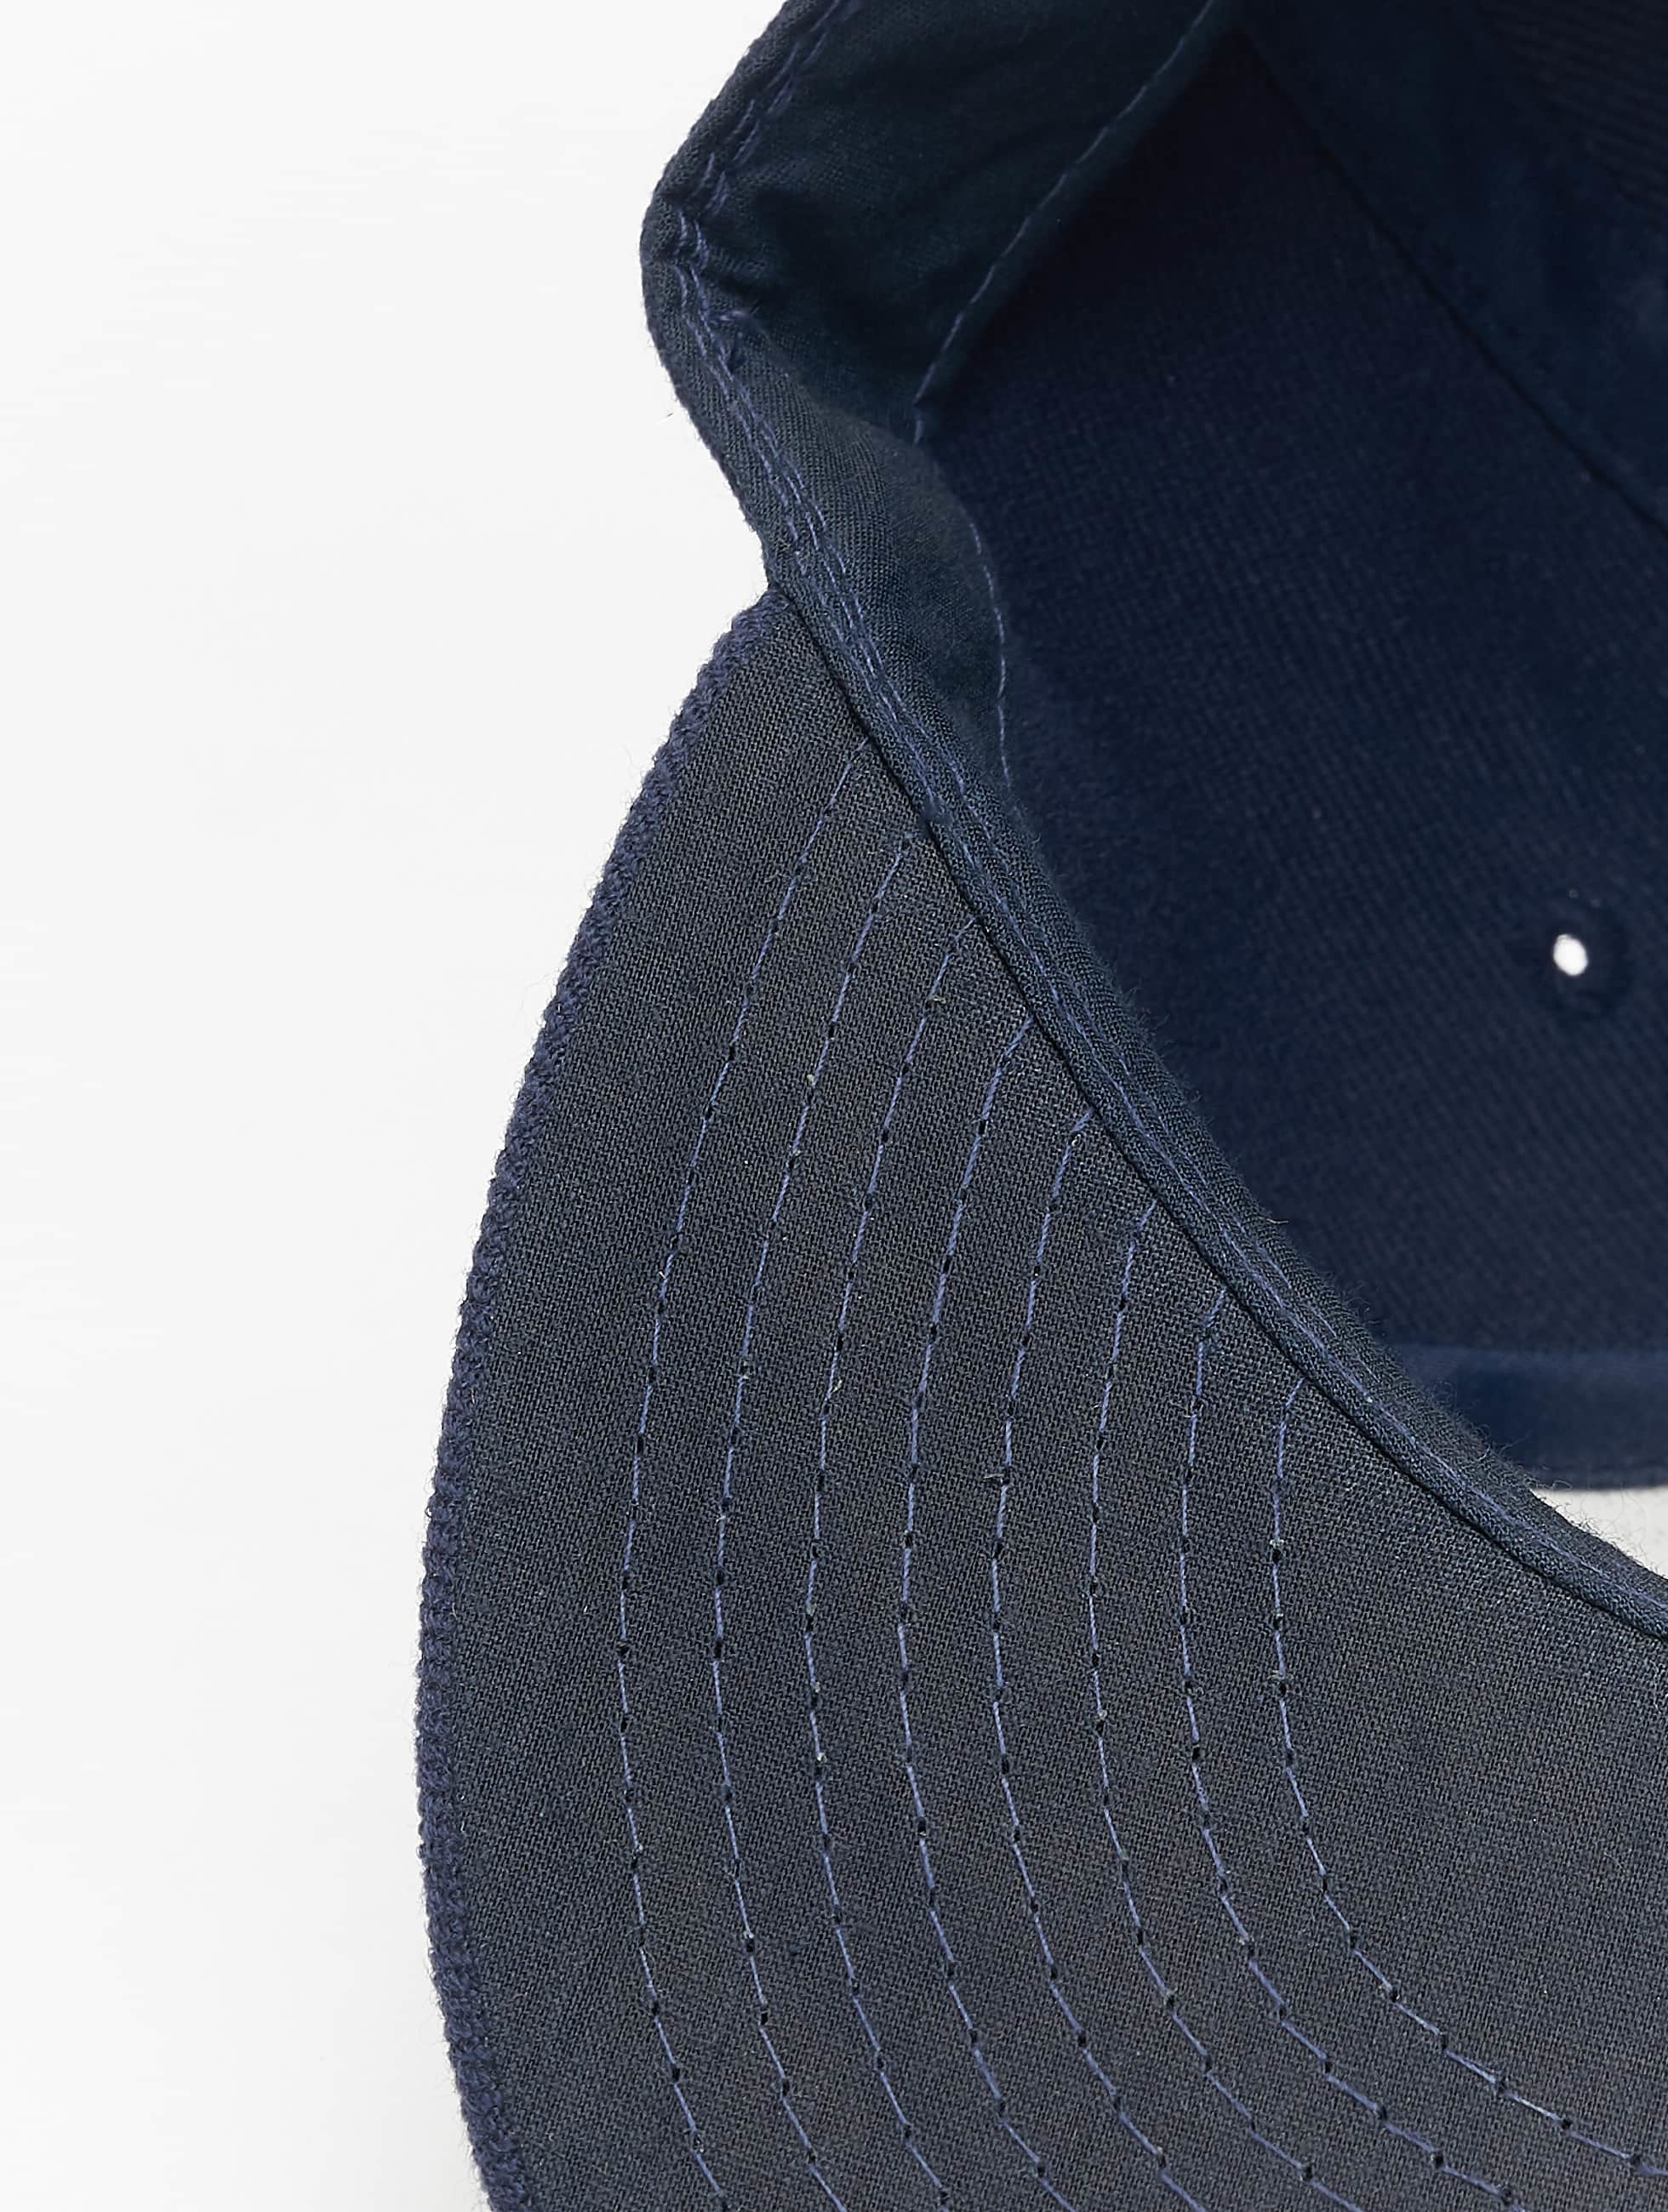 Decky USA Fitted Cap Flat Bill blau